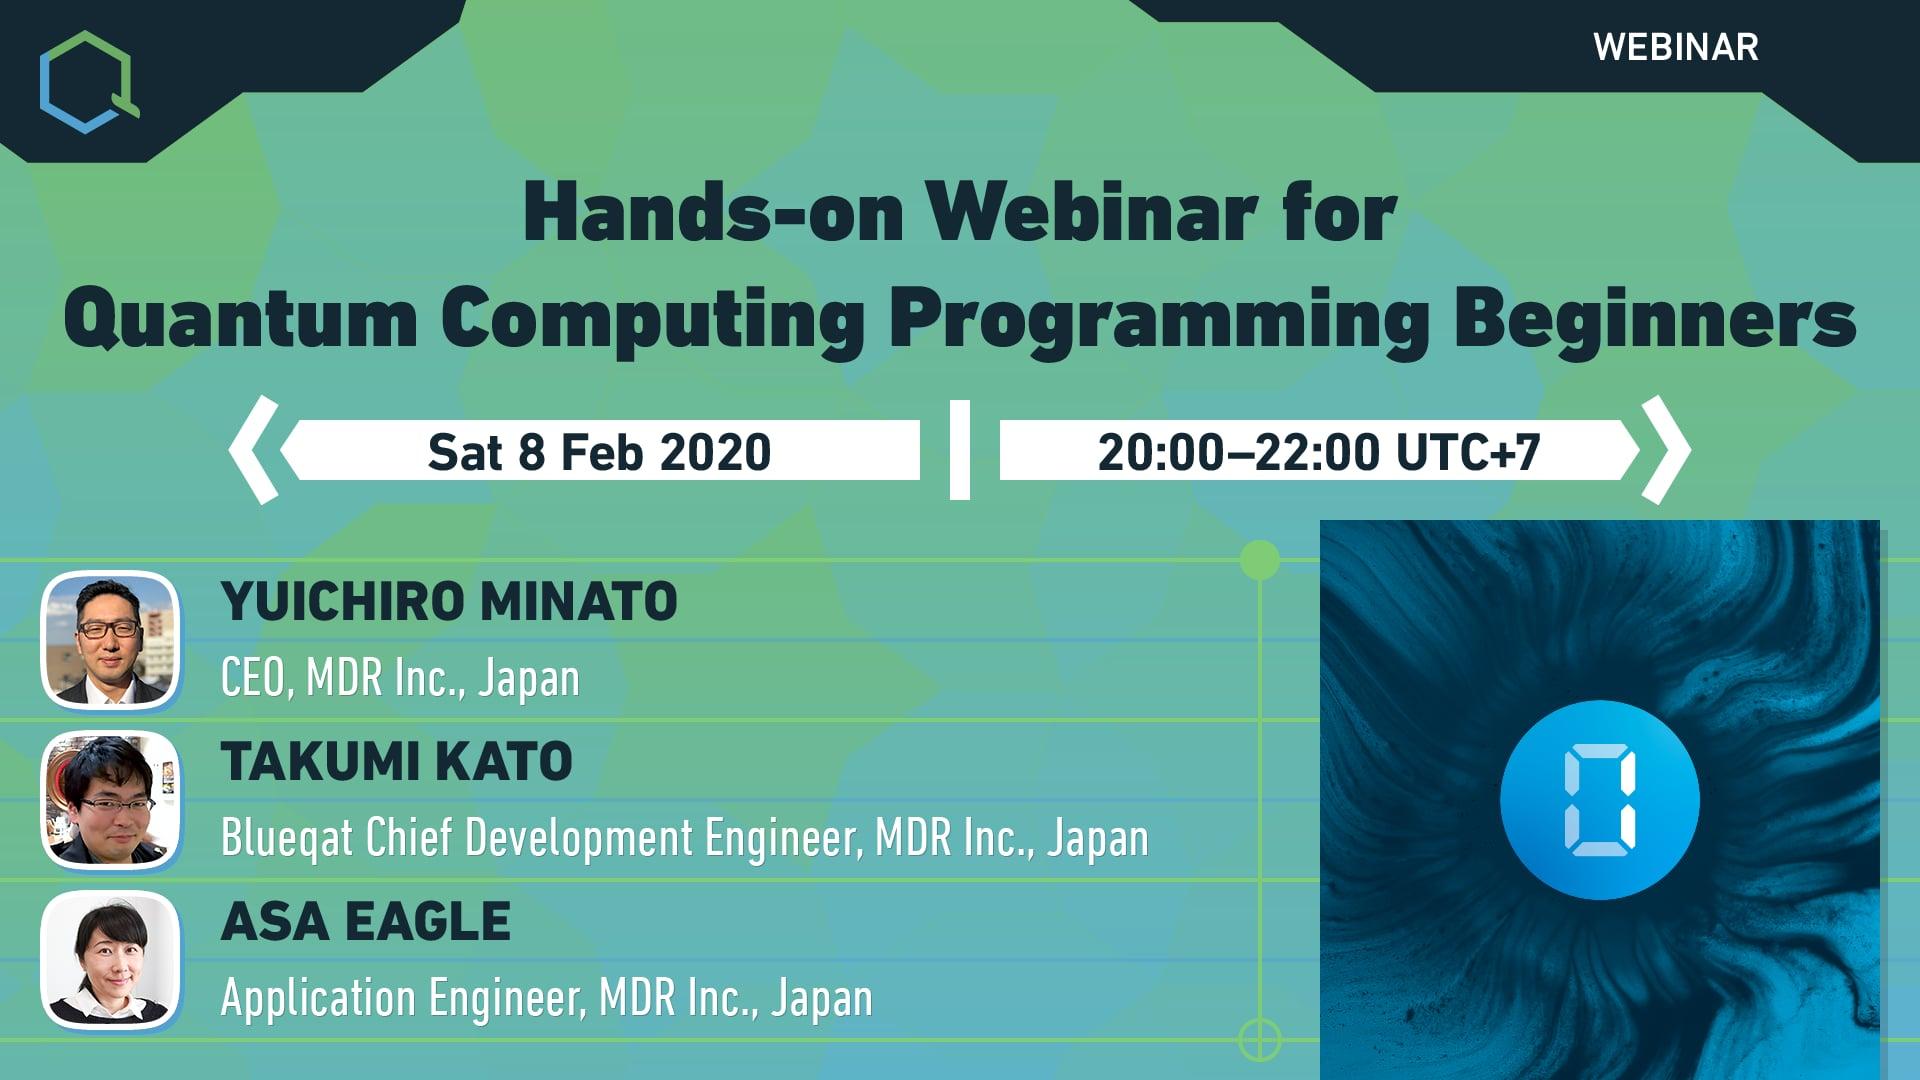 Hands-on Webinar for Quantum Computing Programming Beginners